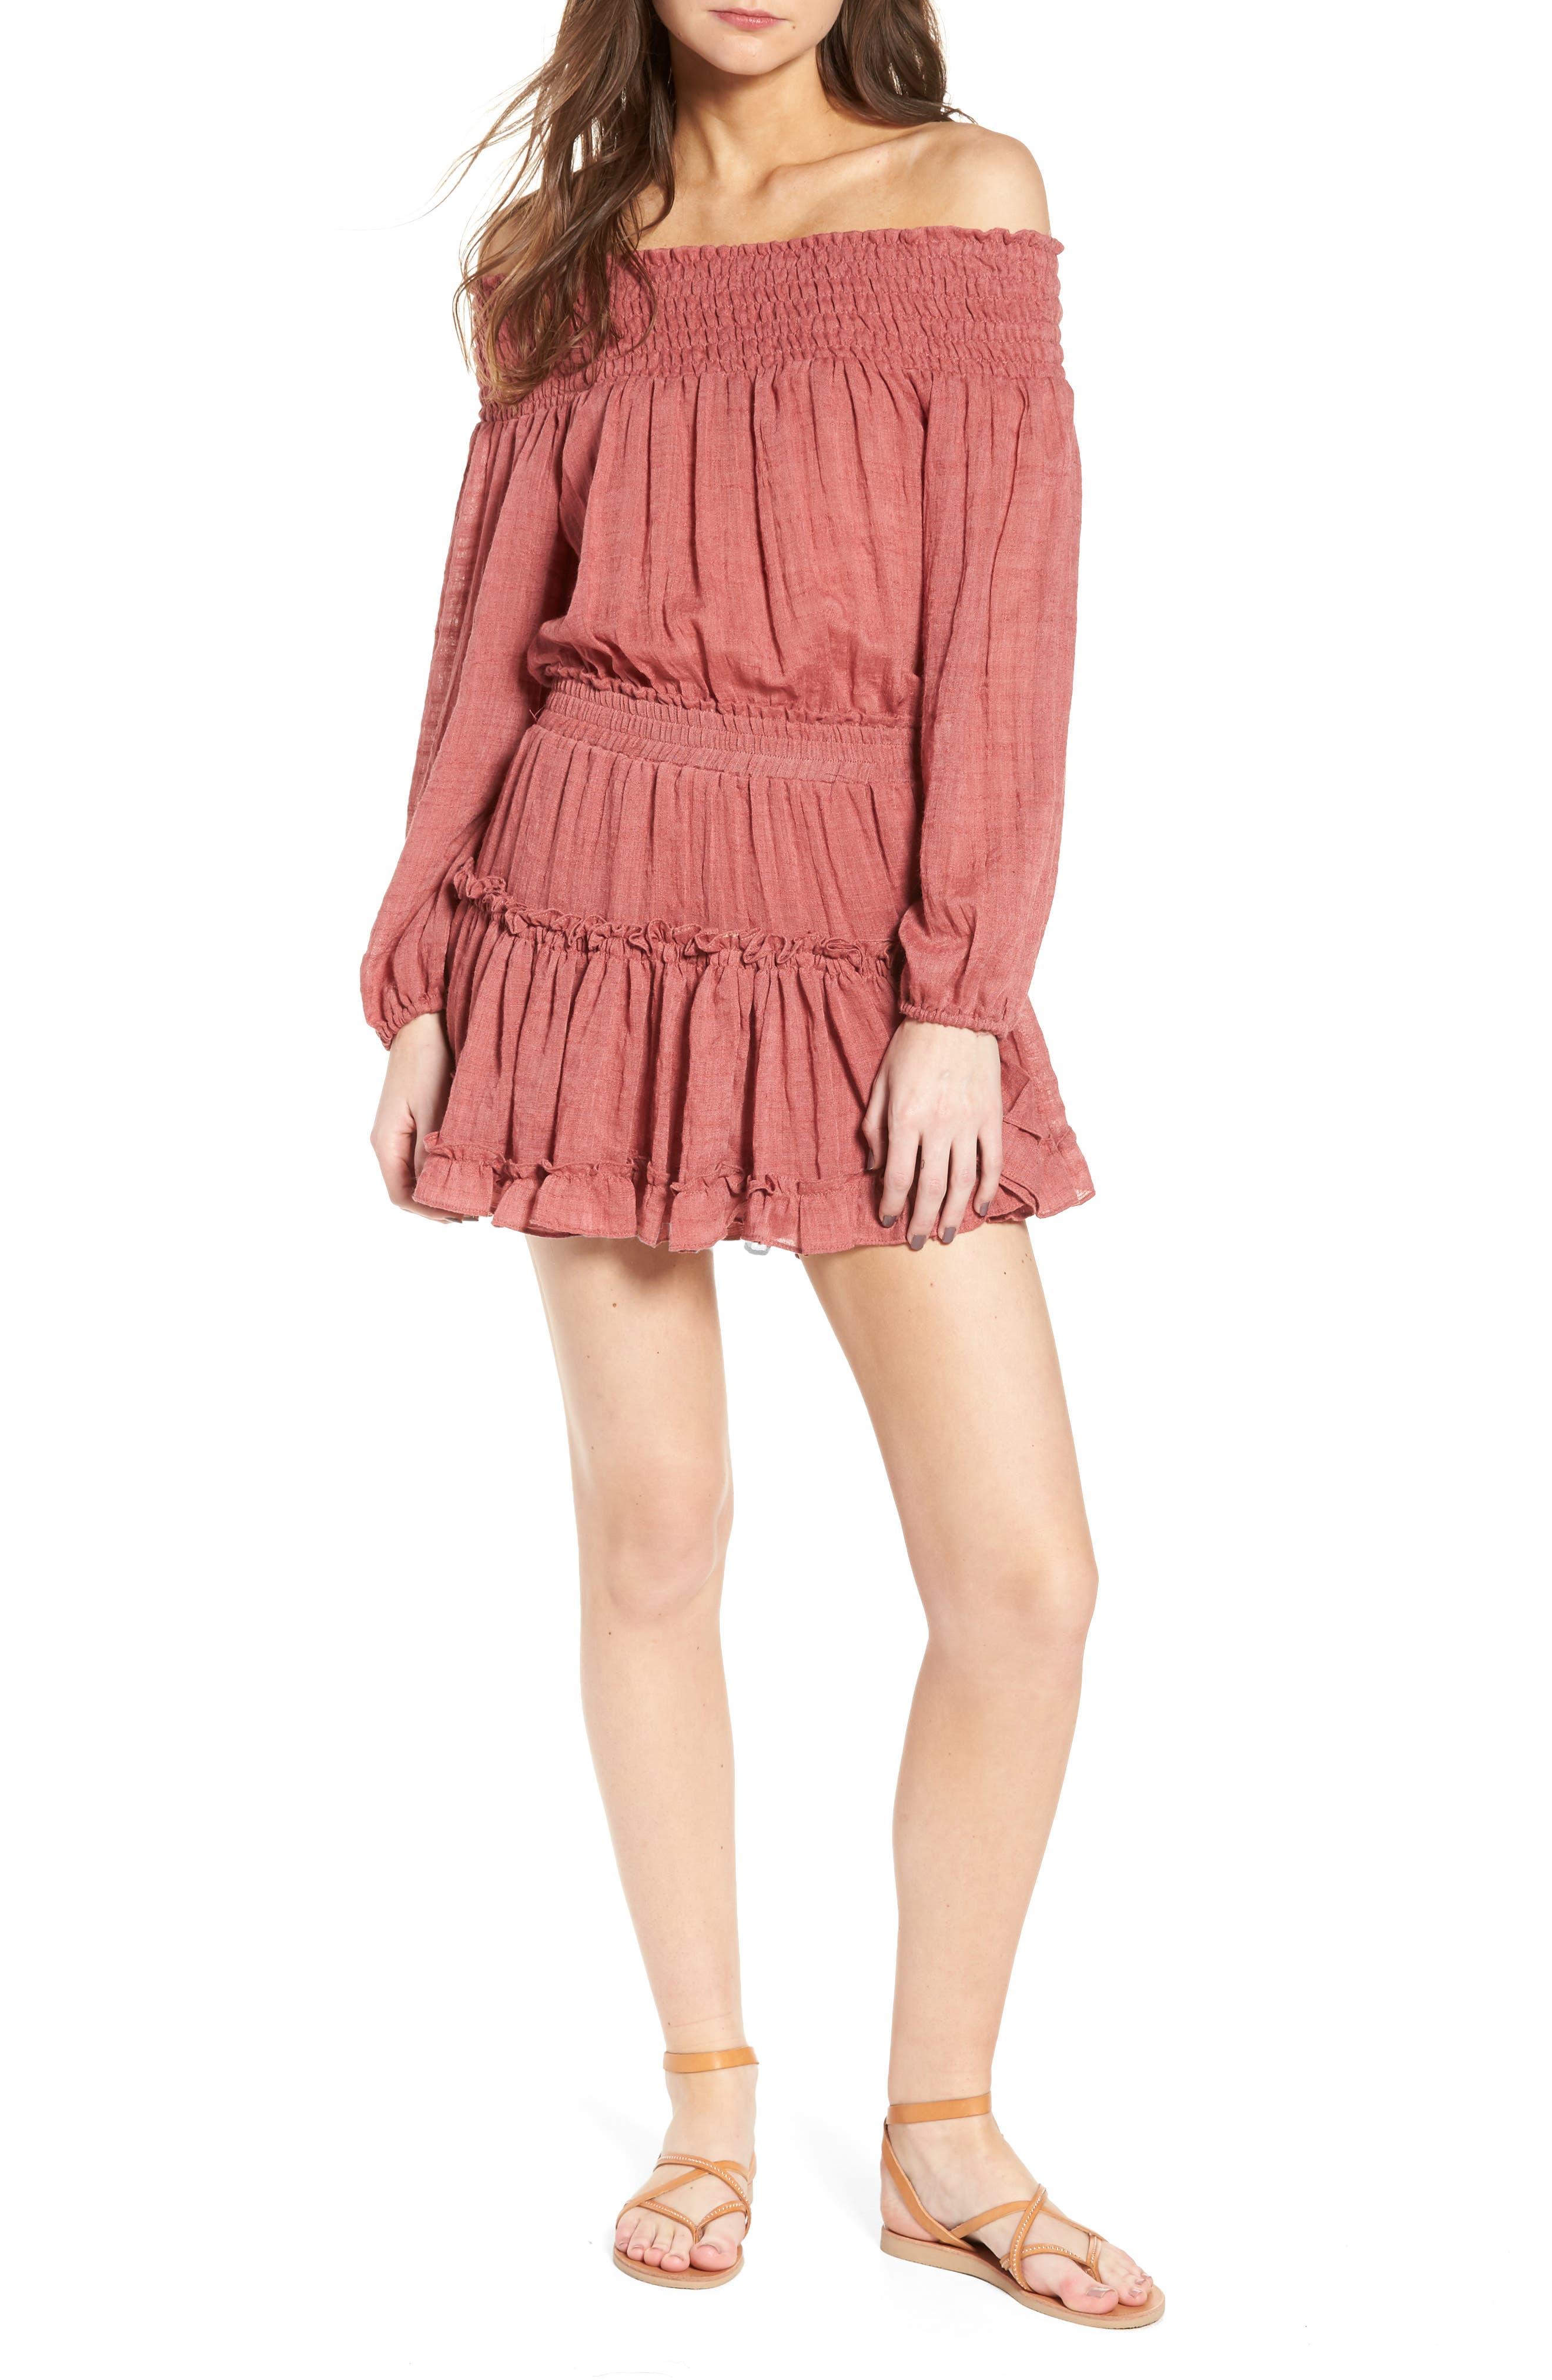 MISA Los Angeles Darla Off the Shoulder Minidress